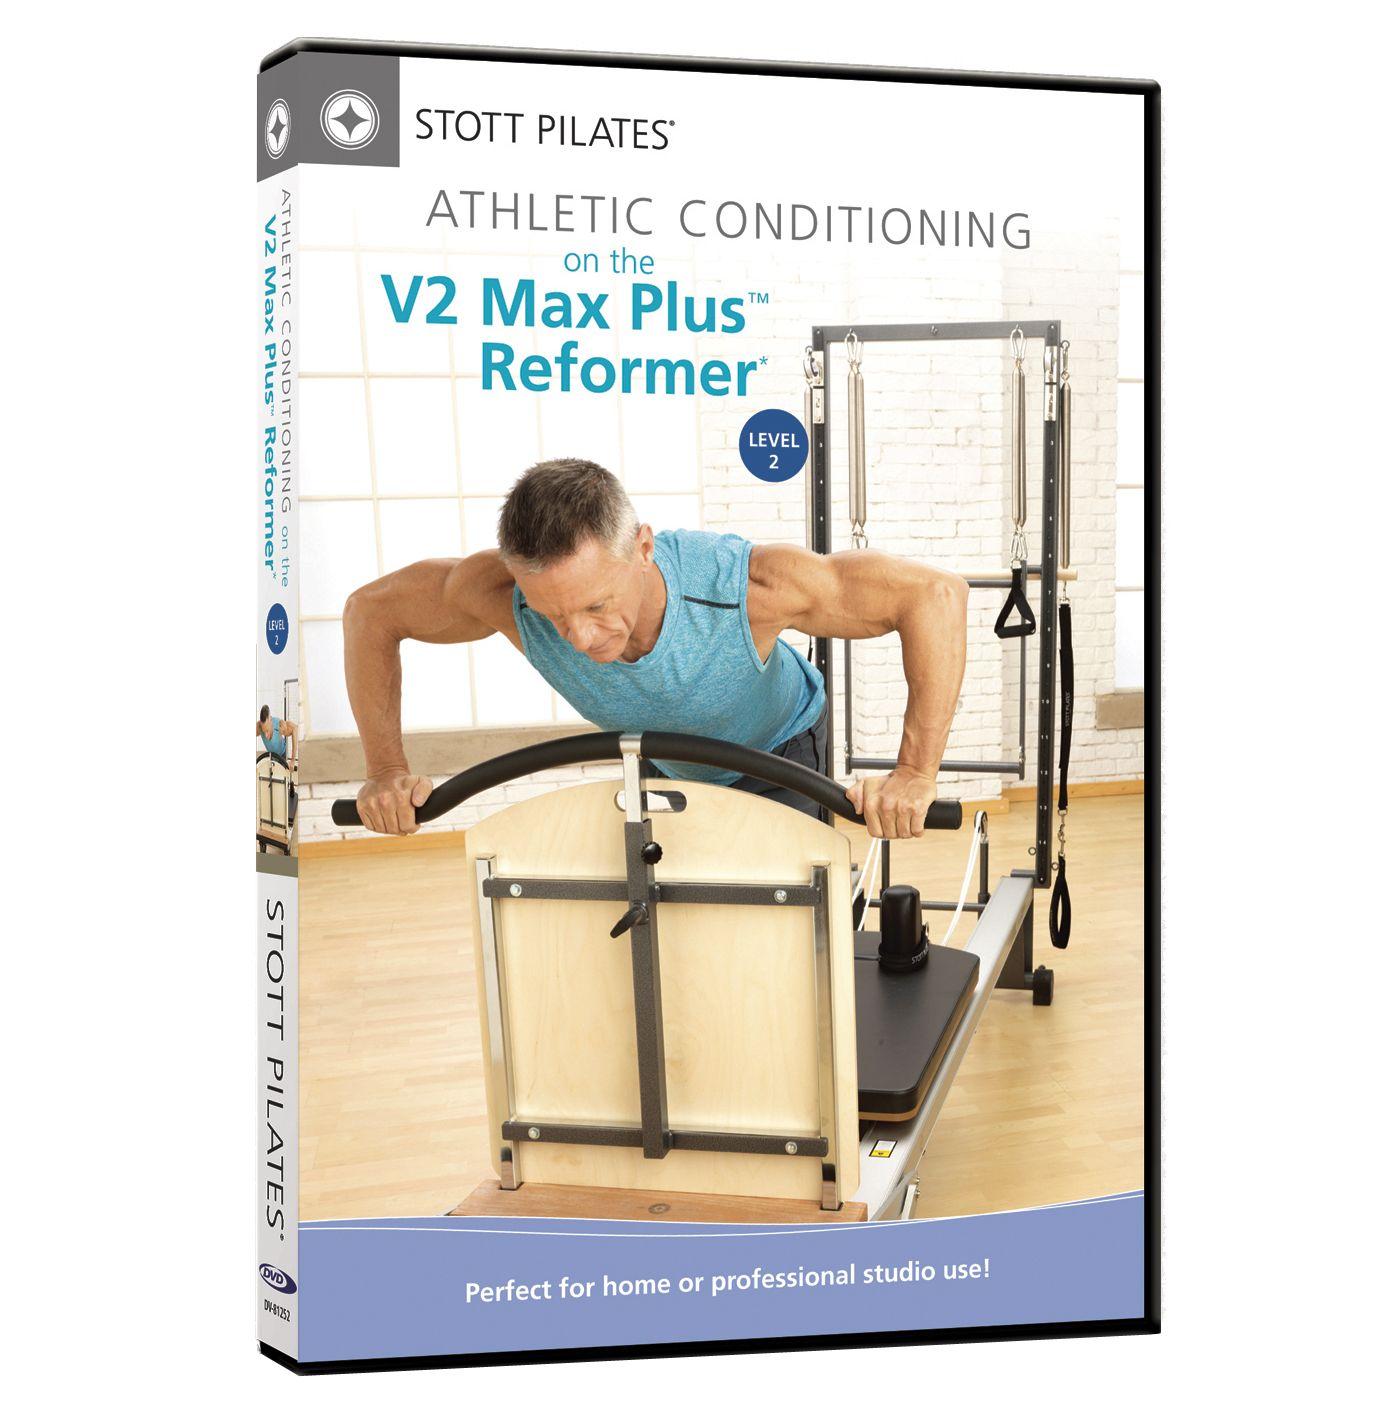 STOTT PILATES Athletic Conditioning on V2 Max Plus Reformer, Level 2 DVD